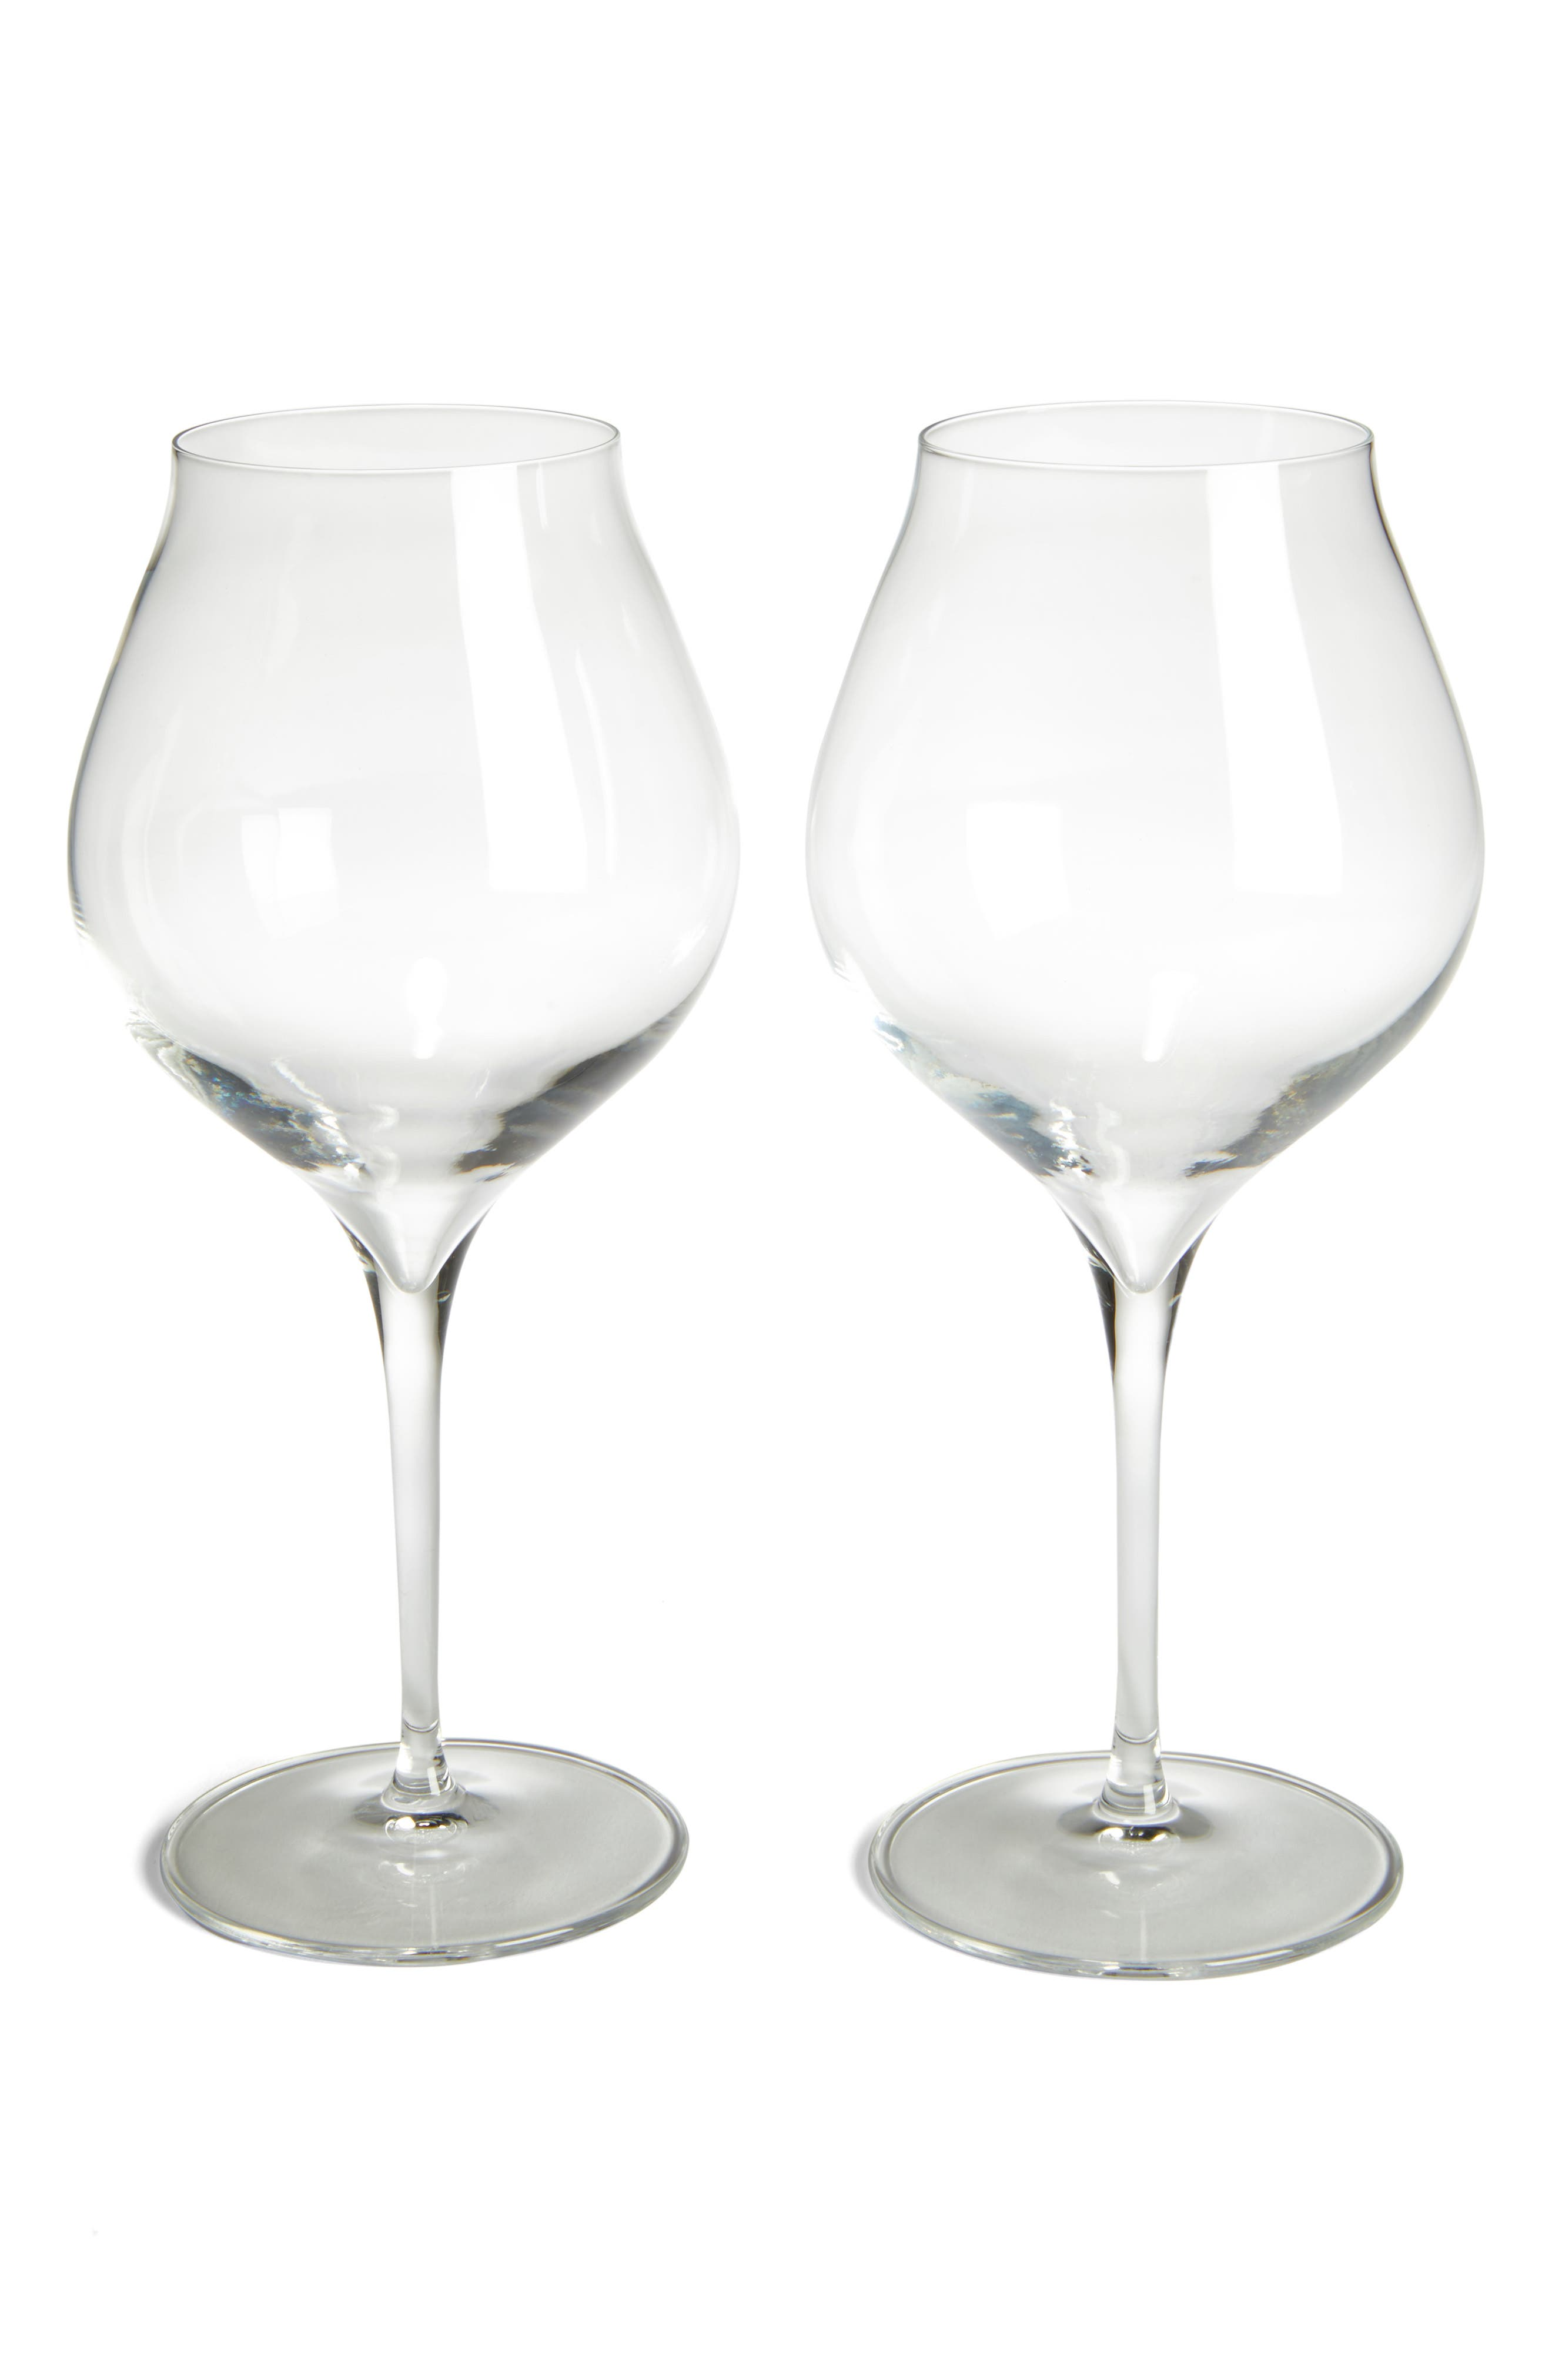 Luigi Bormiolo Vinea Corvina/Amarone Set of 2 Red Wine Glasses,                             Main thumbnail 1, color,                             100